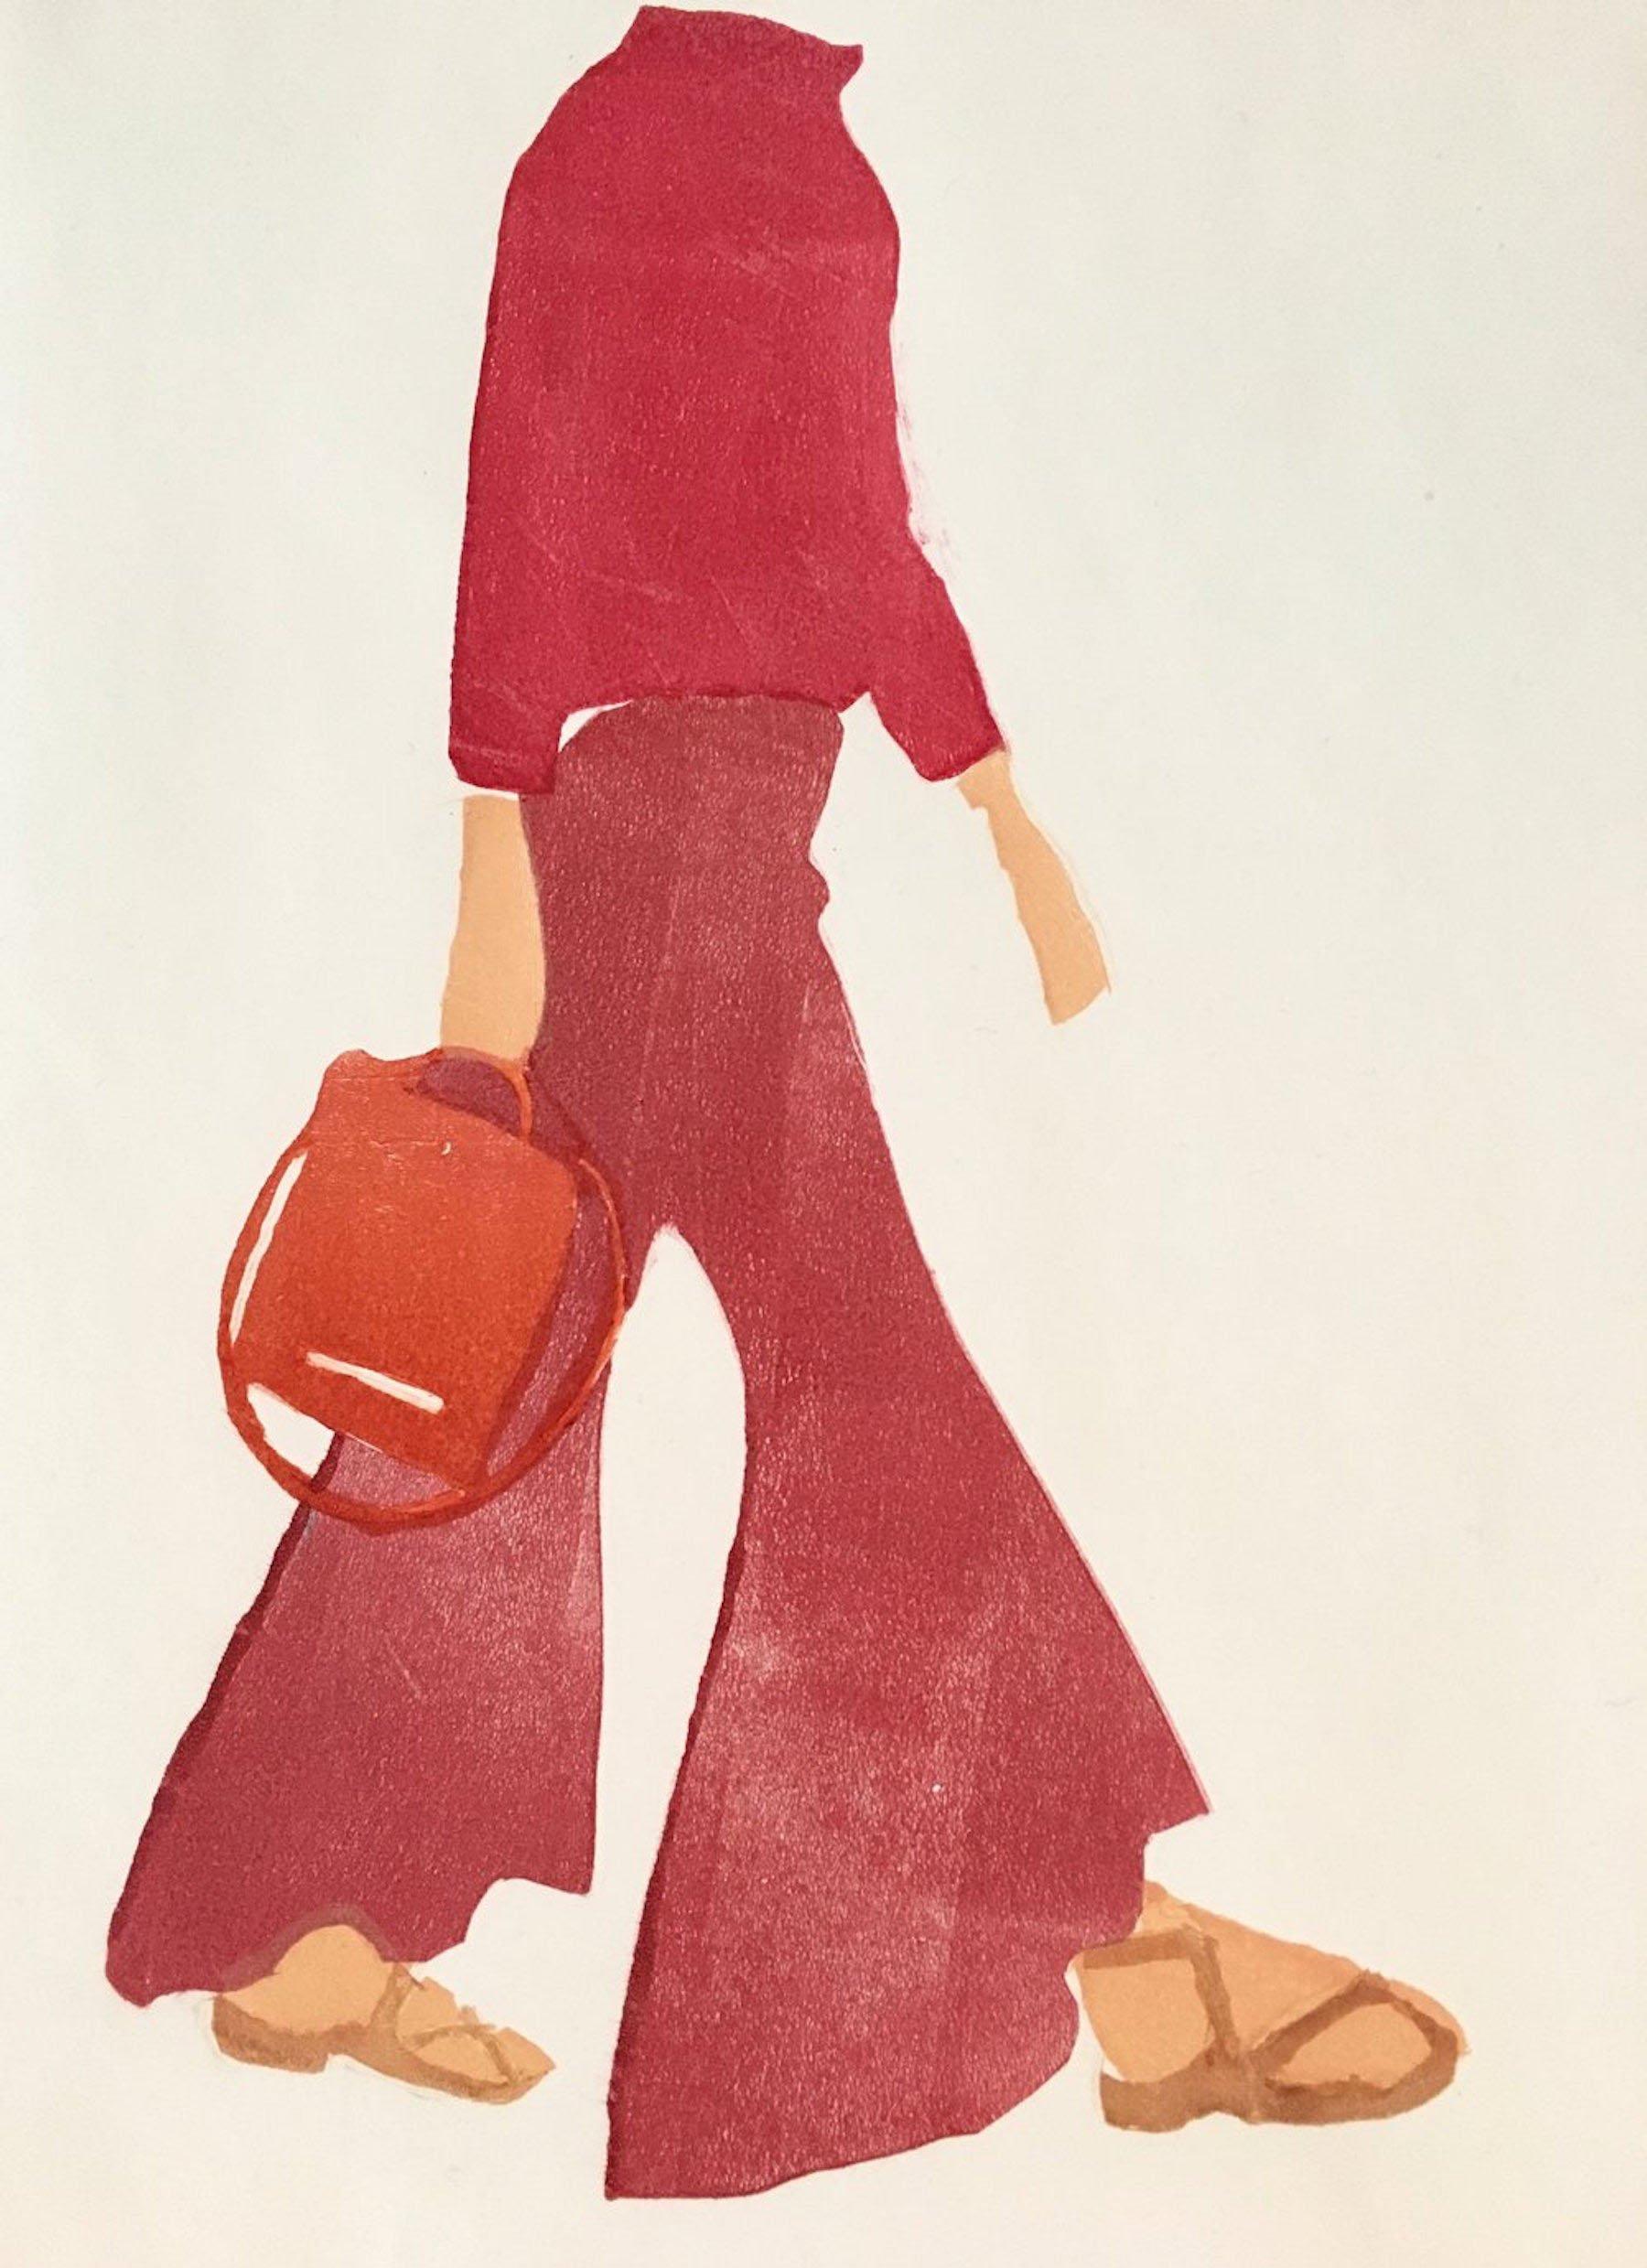 iGNANT-Art-Renee-Gouin-09